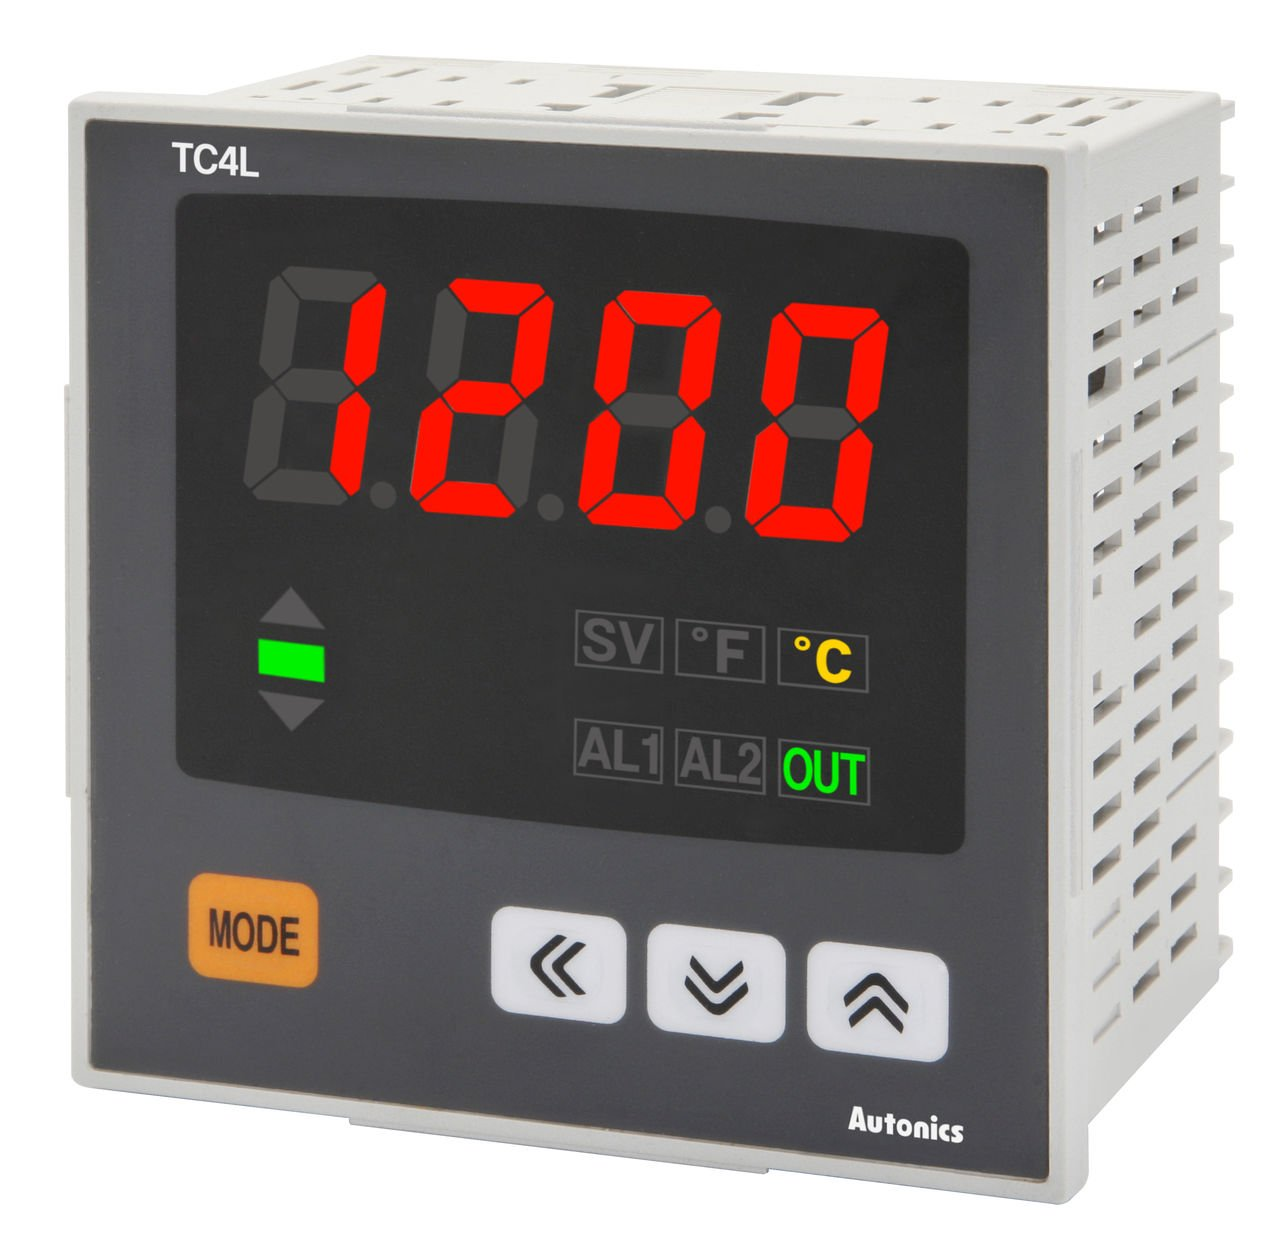 Autonics TC4L-N4N Temp Indicator, DIN W96 X H96mm, Single display 4 Digit, PID Control, without control output, No Alarm Output, 100-240 VAC